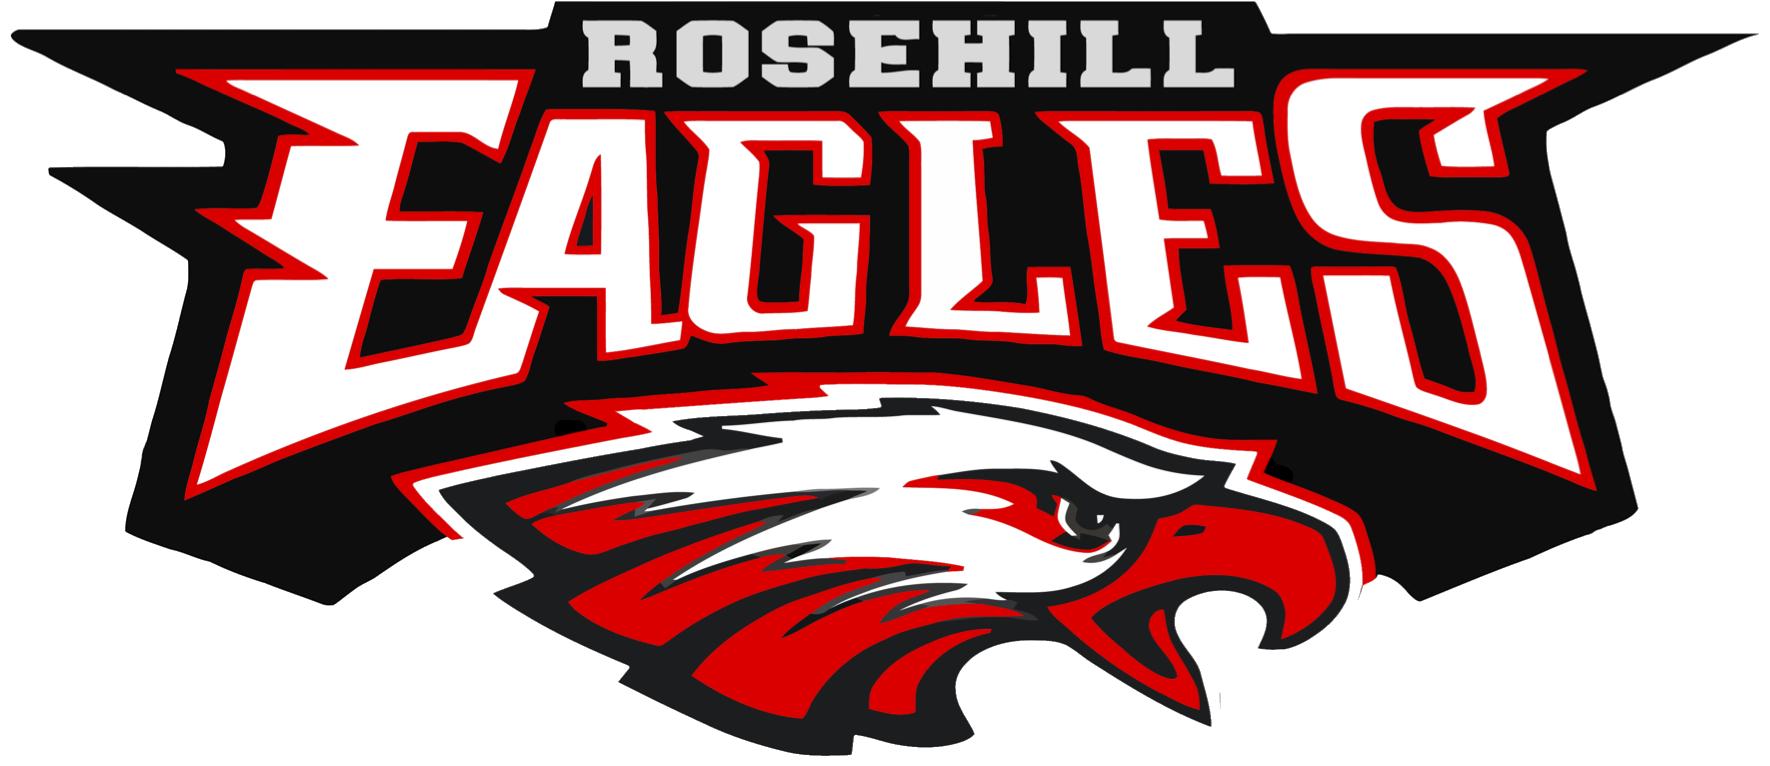 Rosehill Chr.